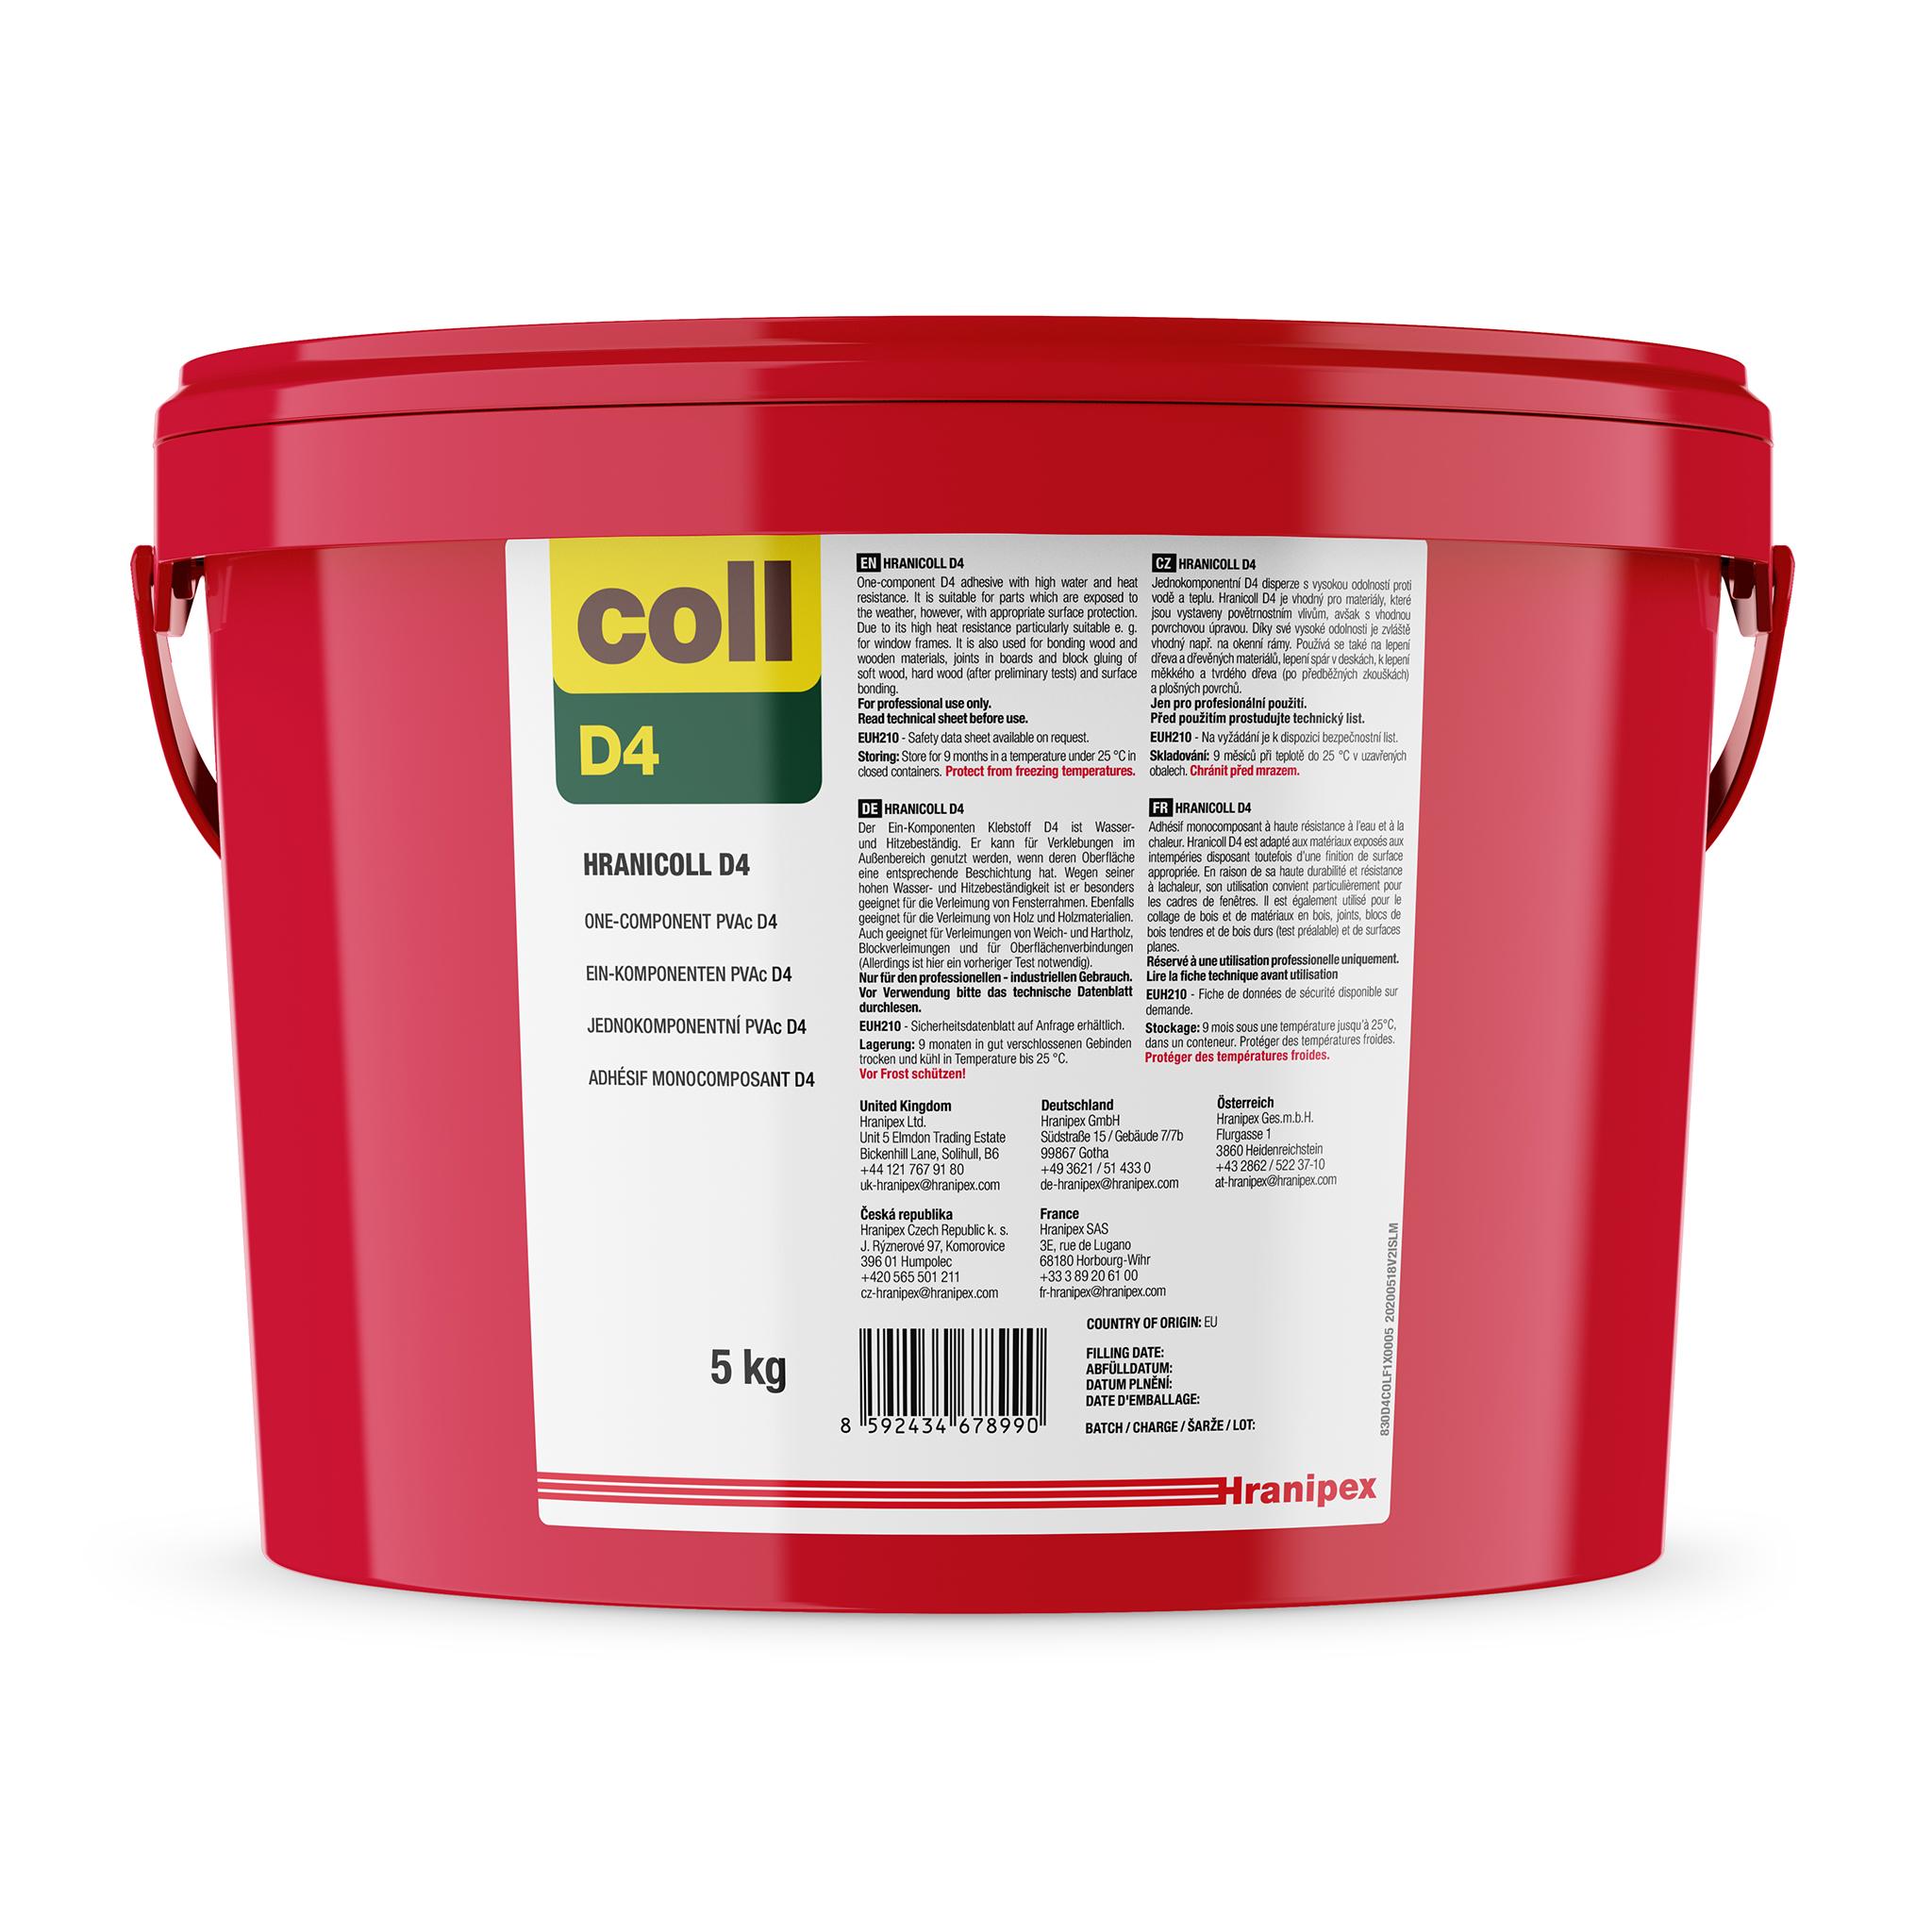 HRANICOLL D4 - PVAc Dispersive Adhesive